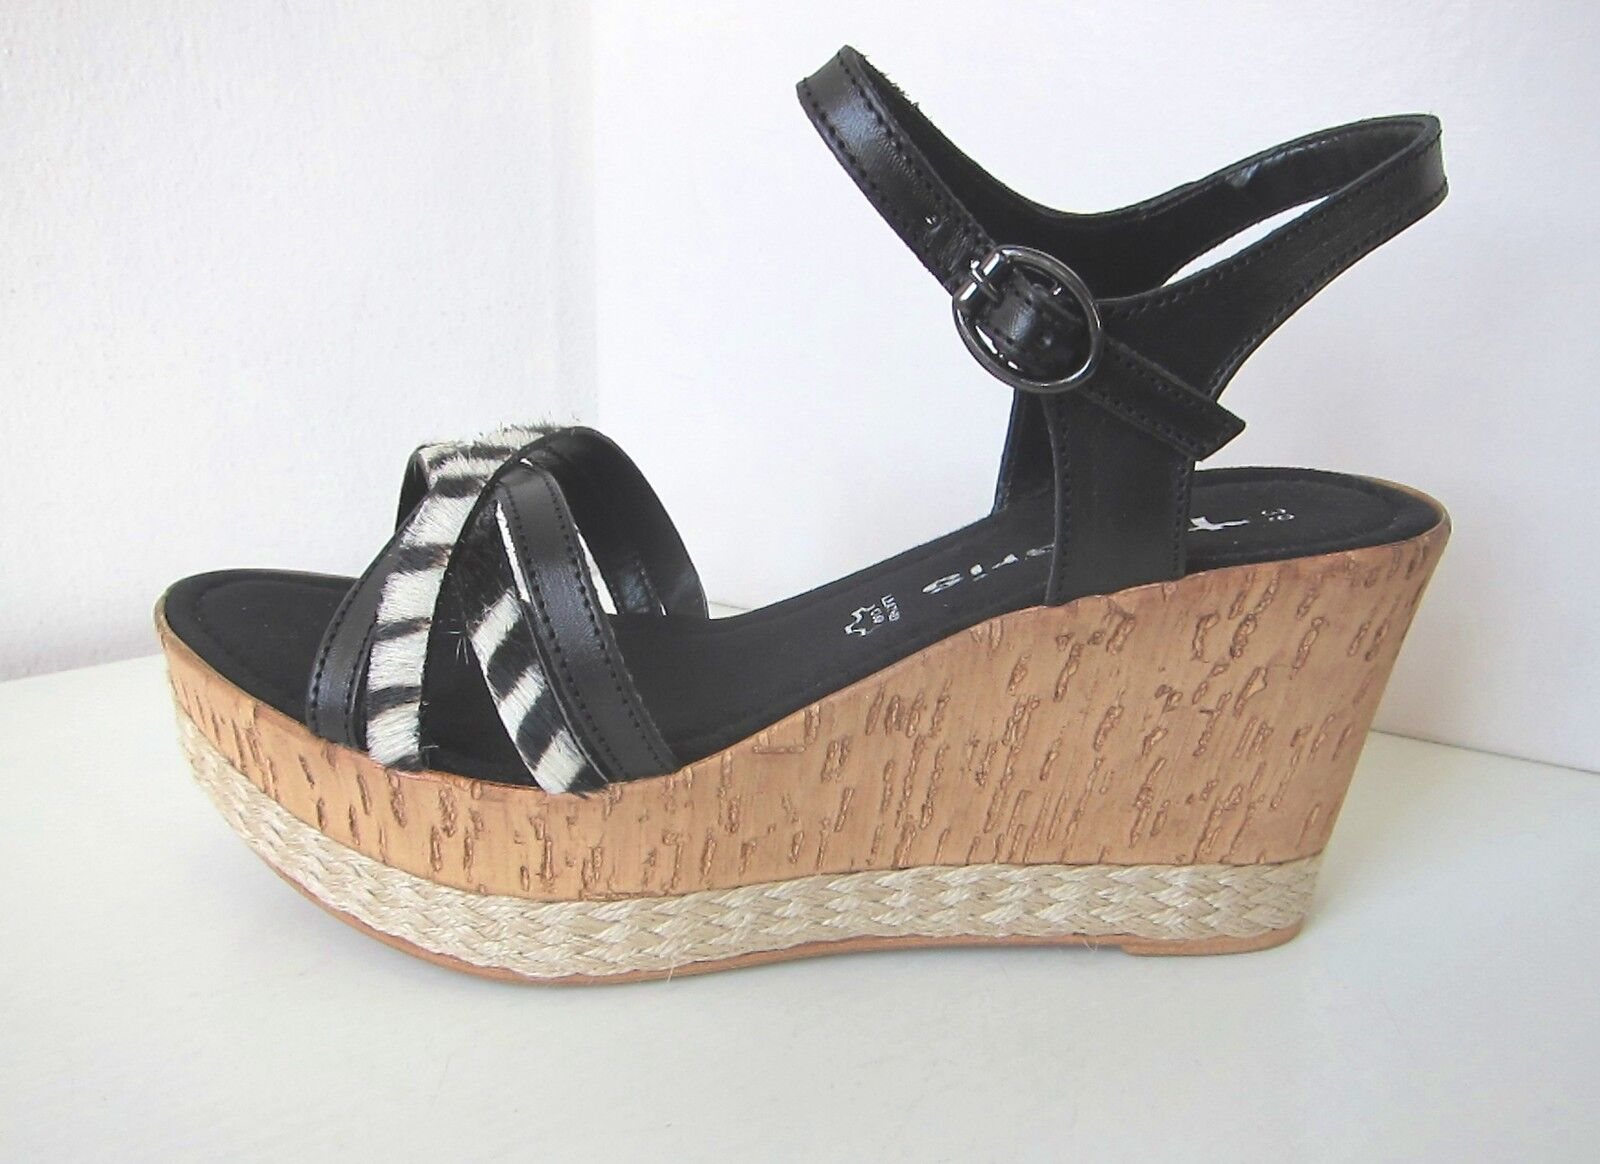 Tamaris semelle talon compense sandales sandales sandales noir zebra 36 platform talons compenses sandals Black b47104